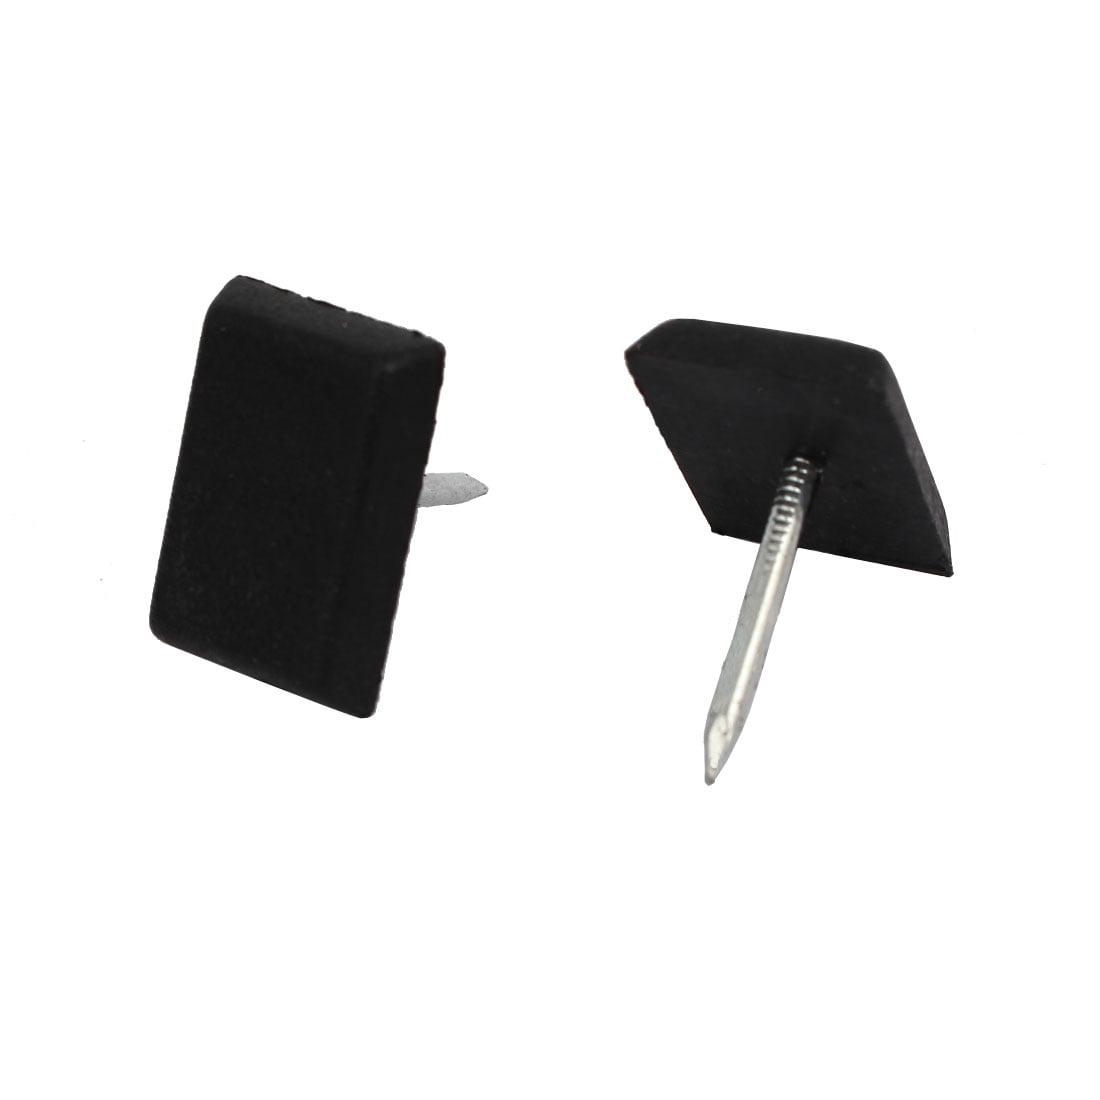 Unique BargainsWood Furniture Leg Foot Floor Protector Pad Glide Nails Black 18mm x 12mm 30PCS - image 1 of 3